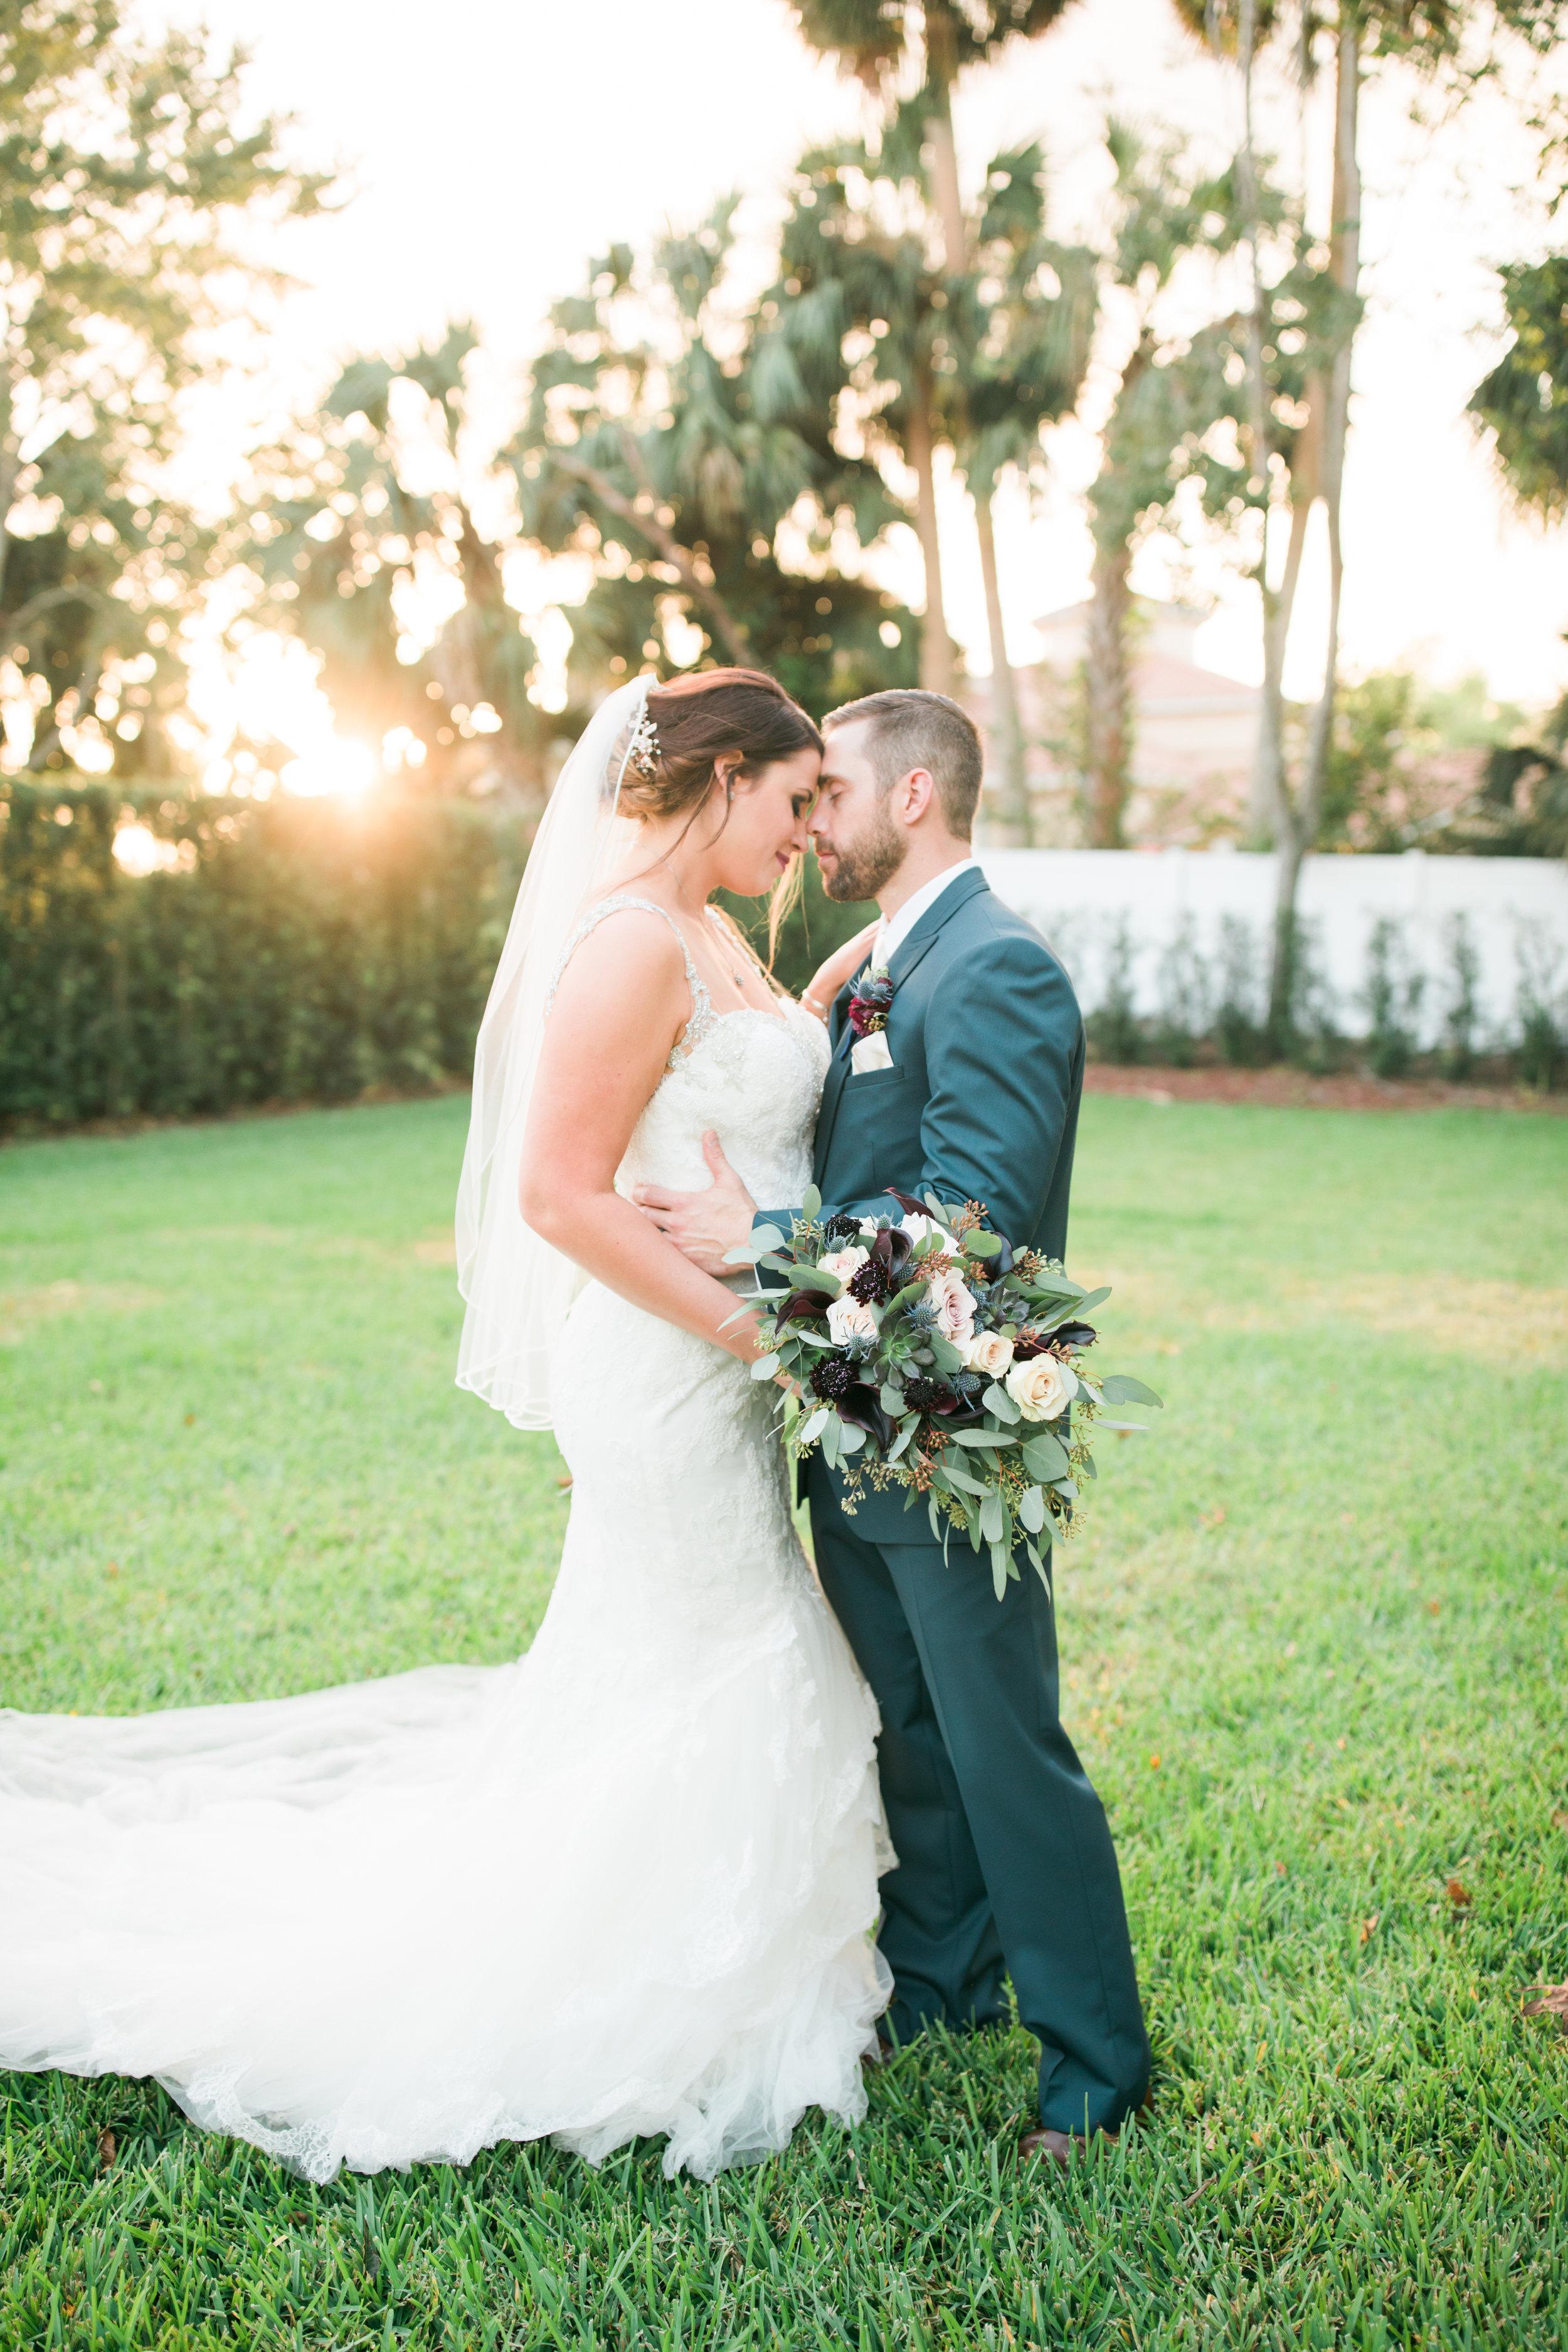 Robyn&Matt_LuxmoreGrandEstate_KatelynnCarlsonPhotography-3082.jpg